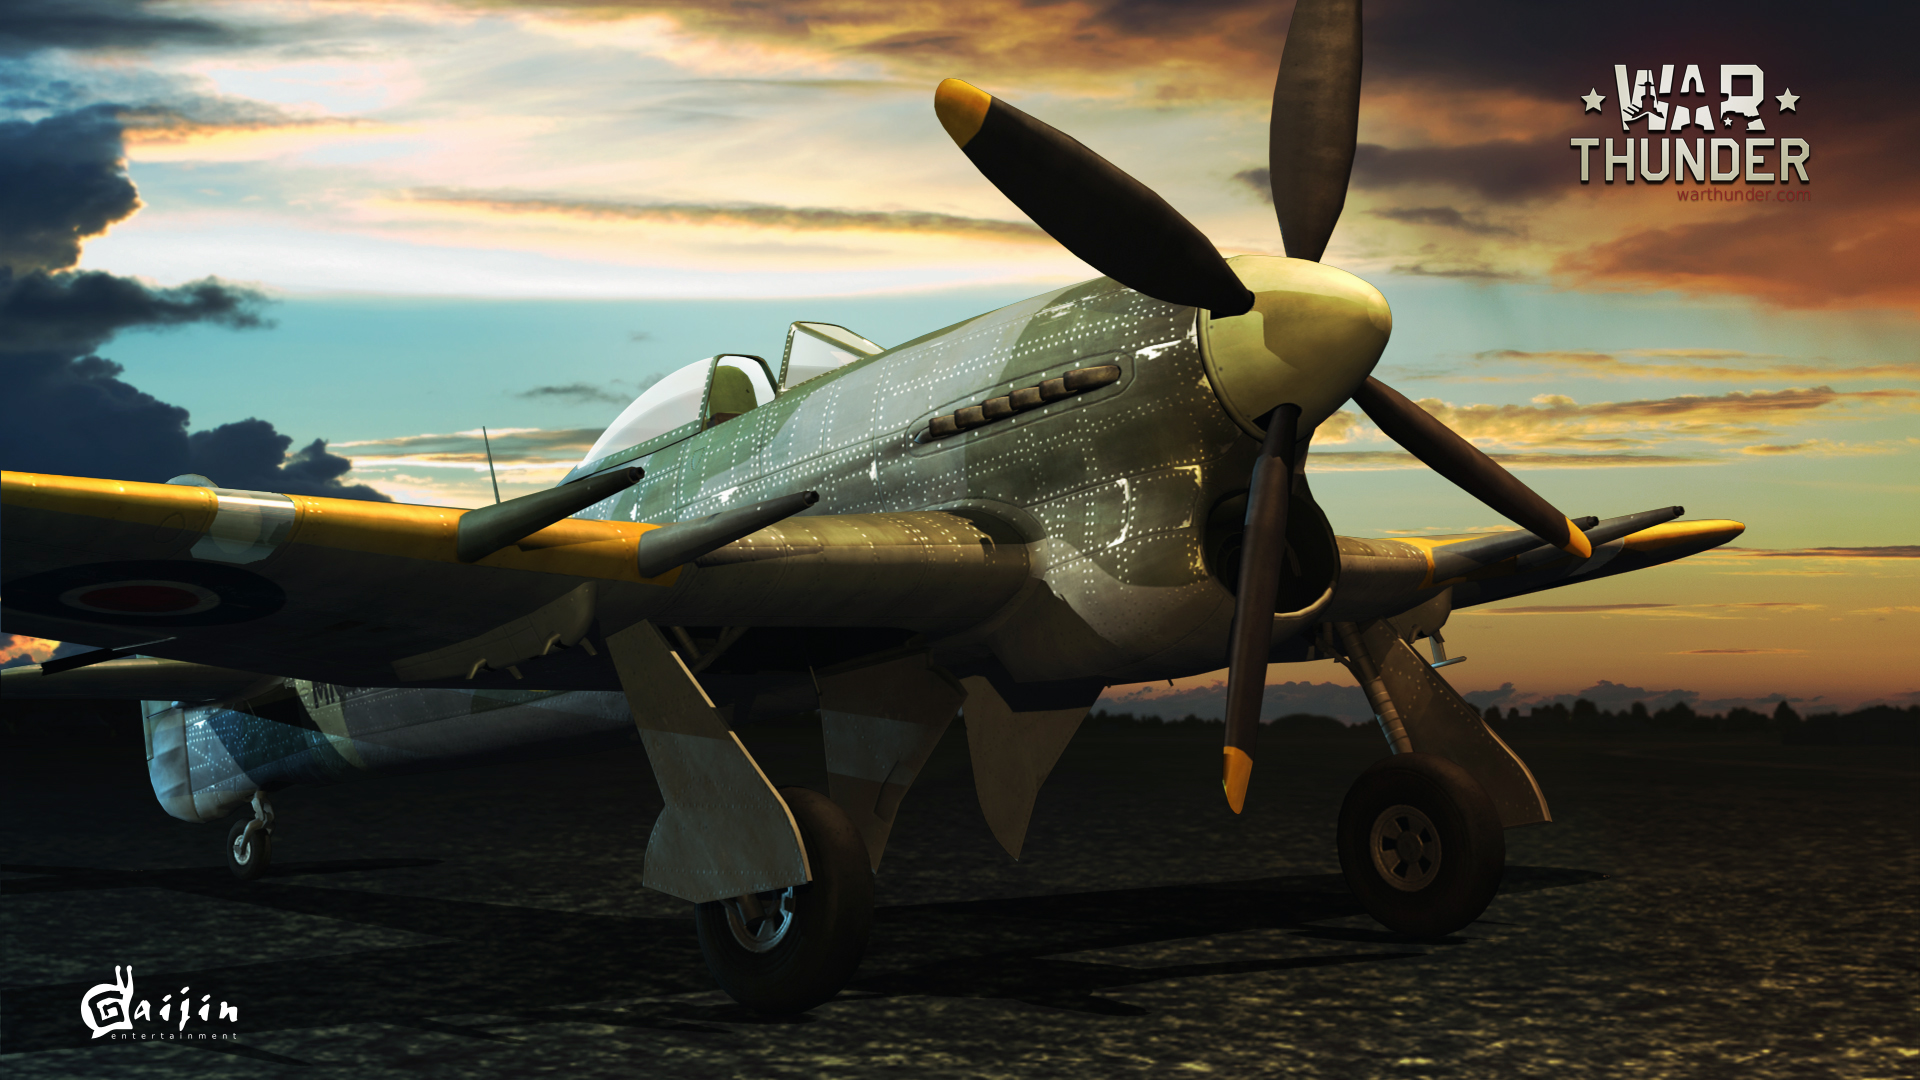 Обои p-61, ww2, black widow, painting, истребитель, P-61 black widow, aircraft art. Авиация foto 19